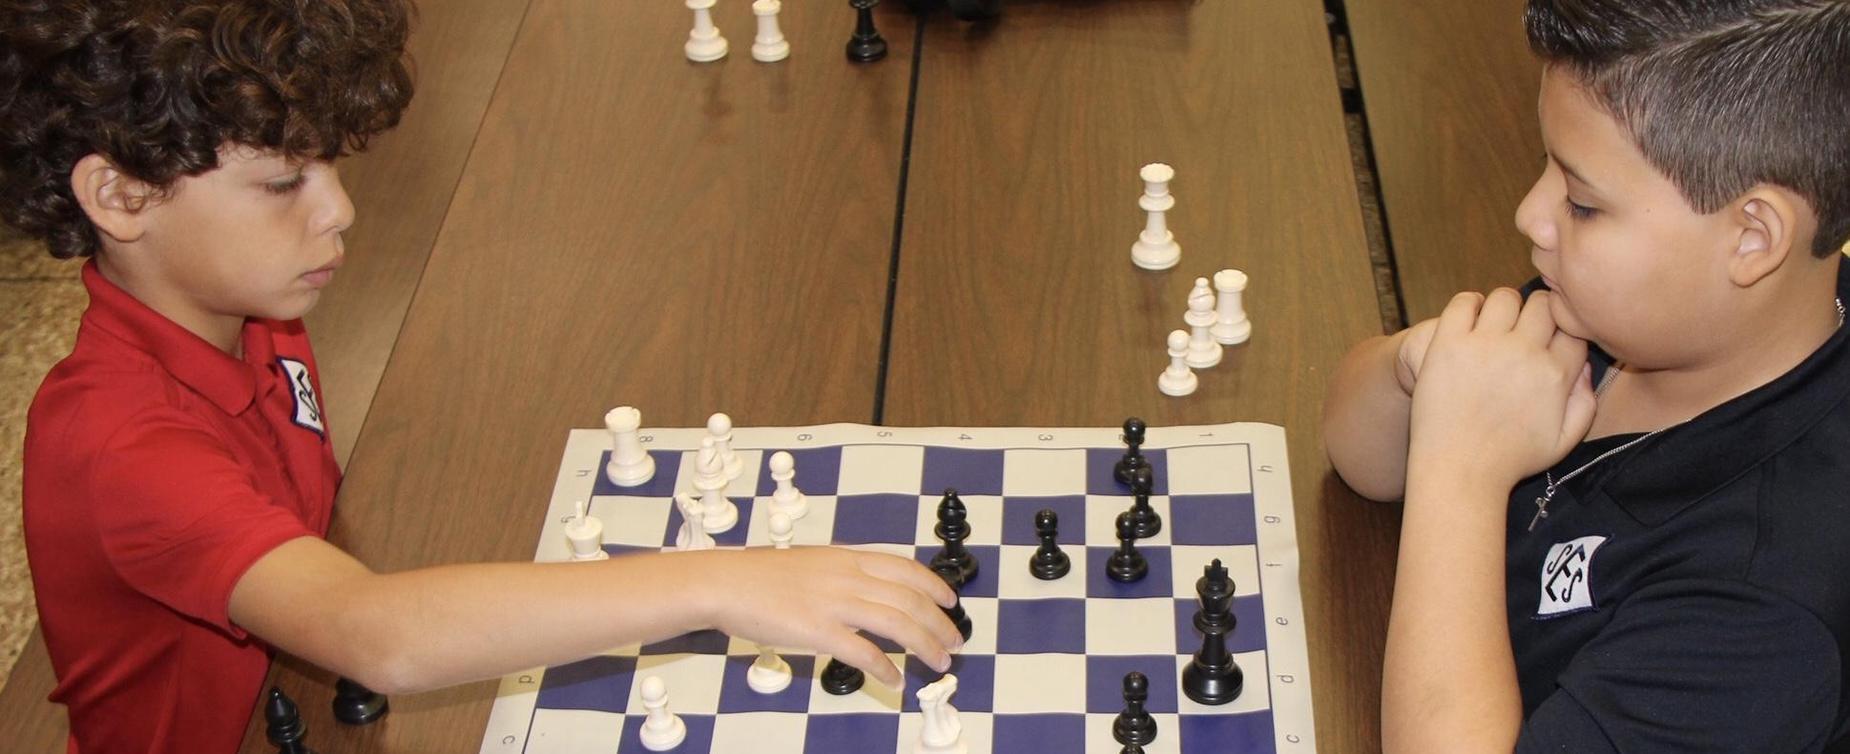 Chess Focus